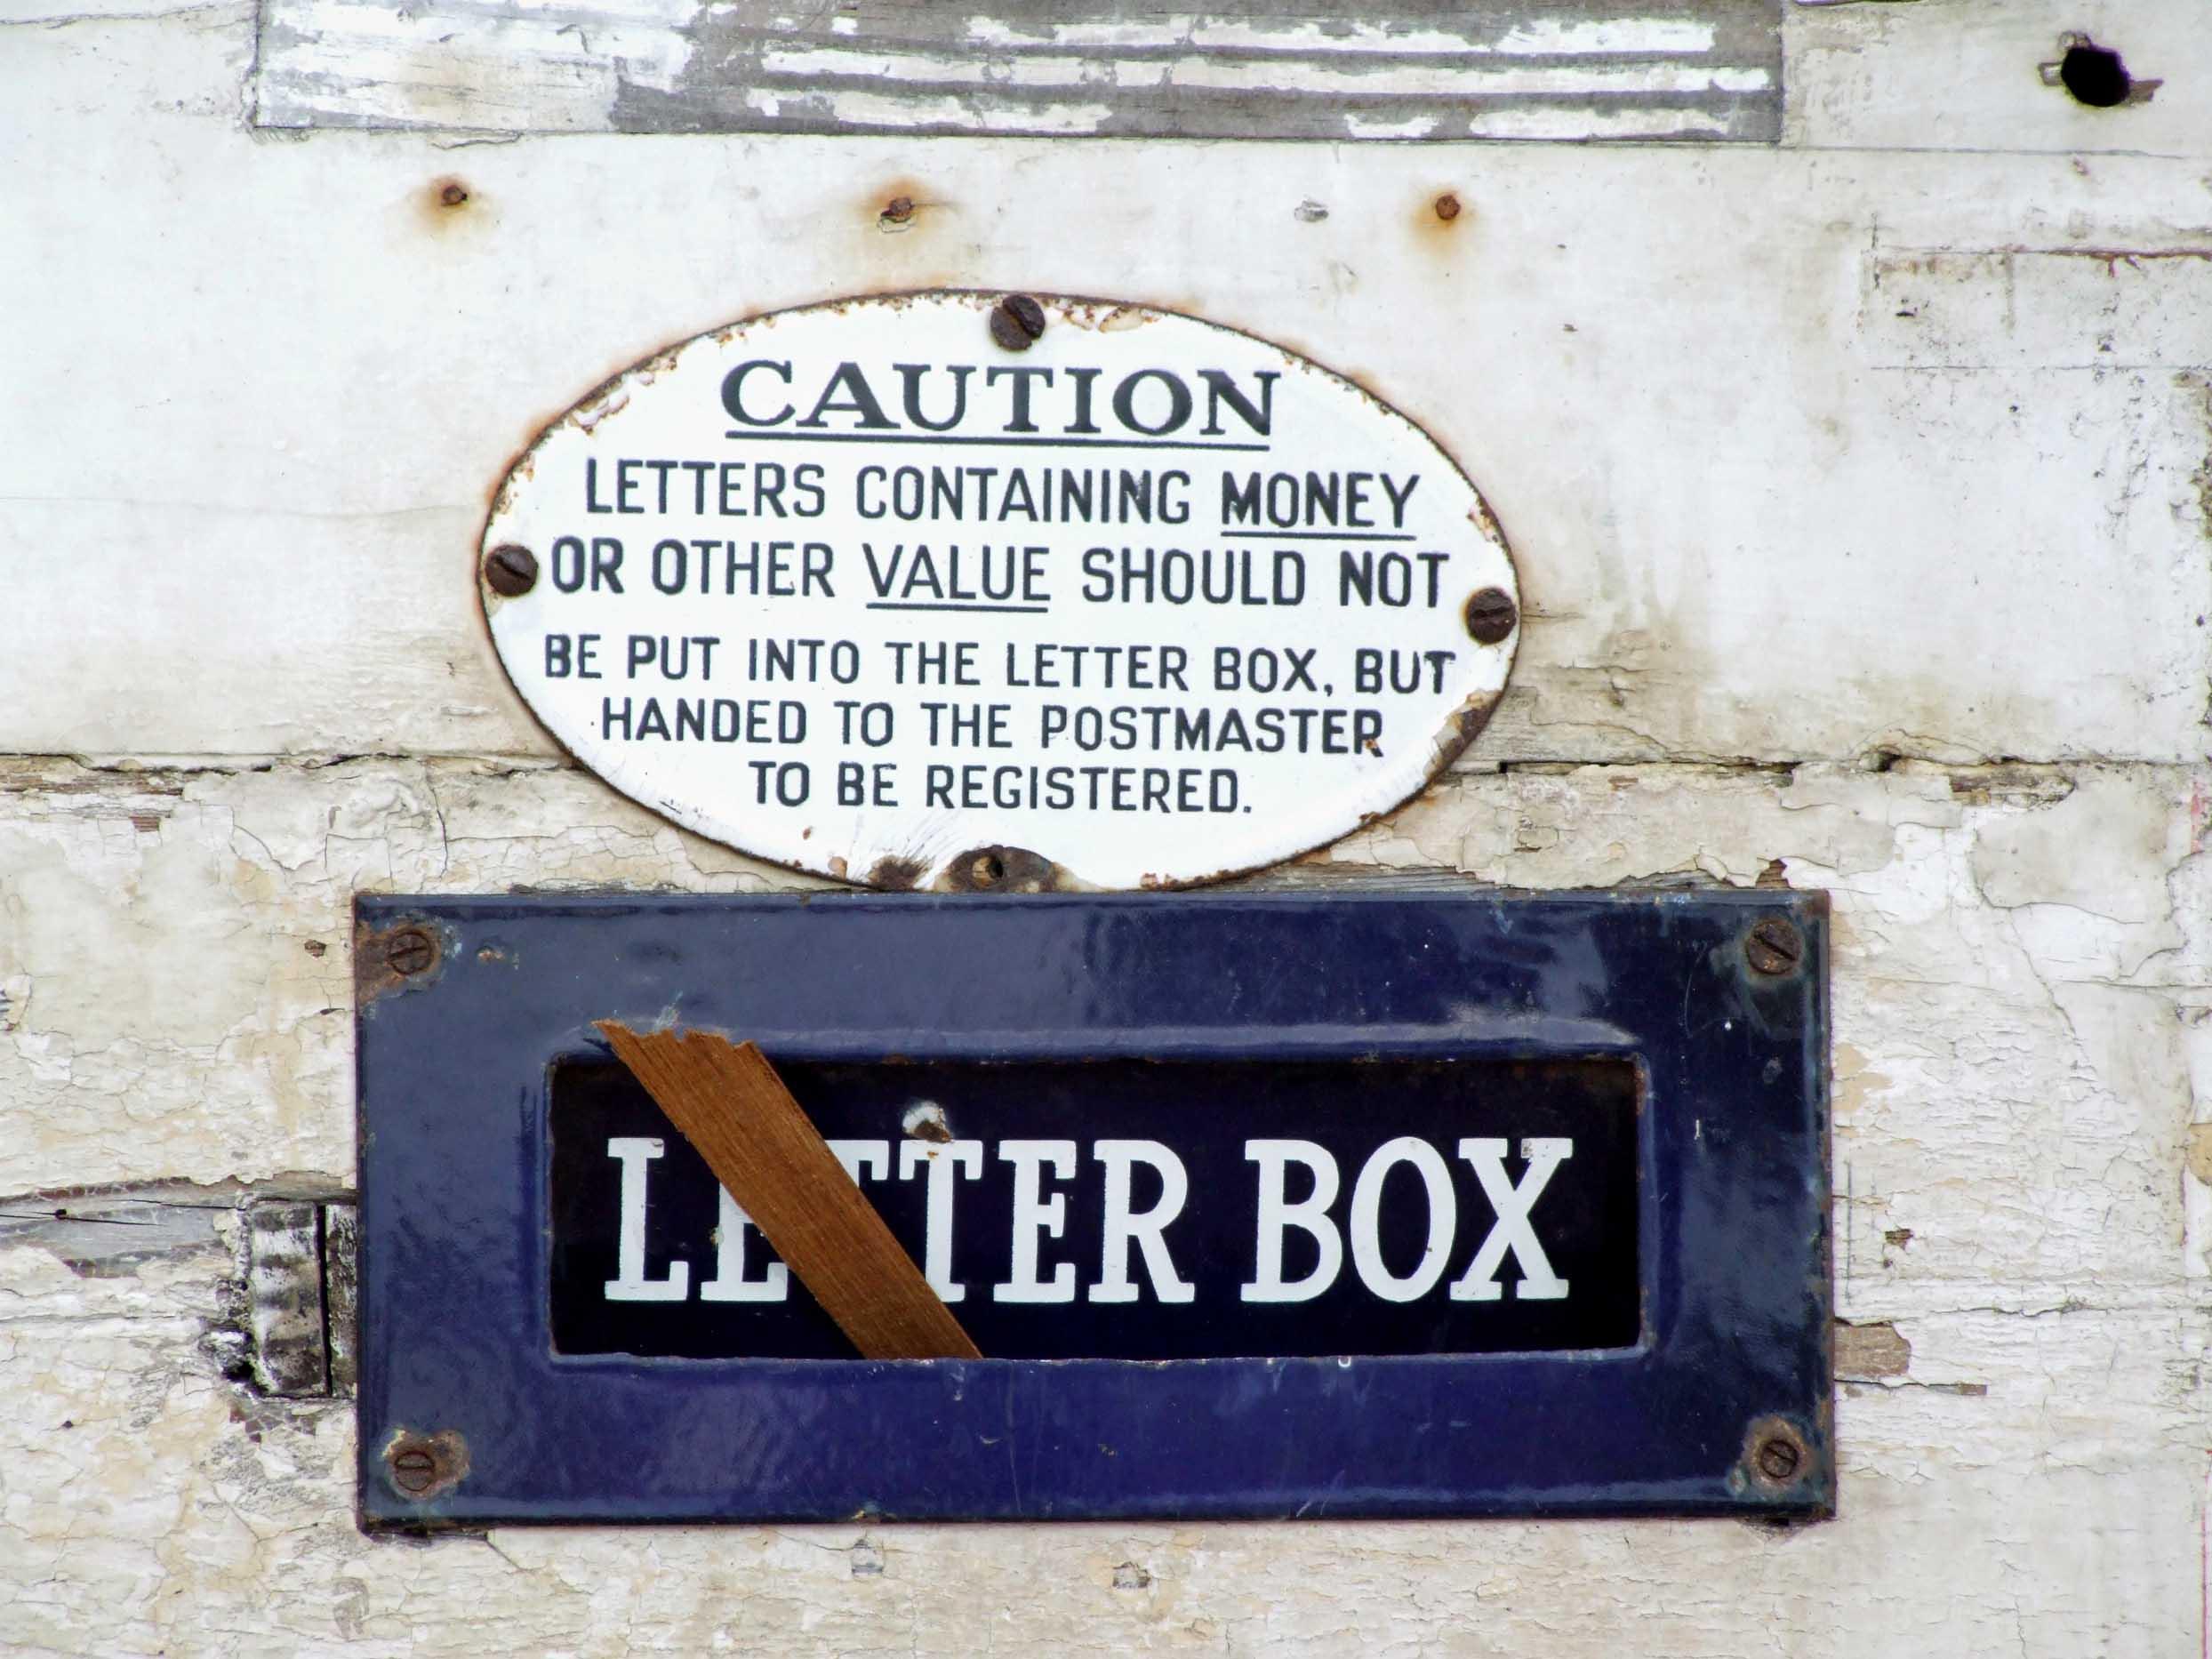 Sealed-up letter box